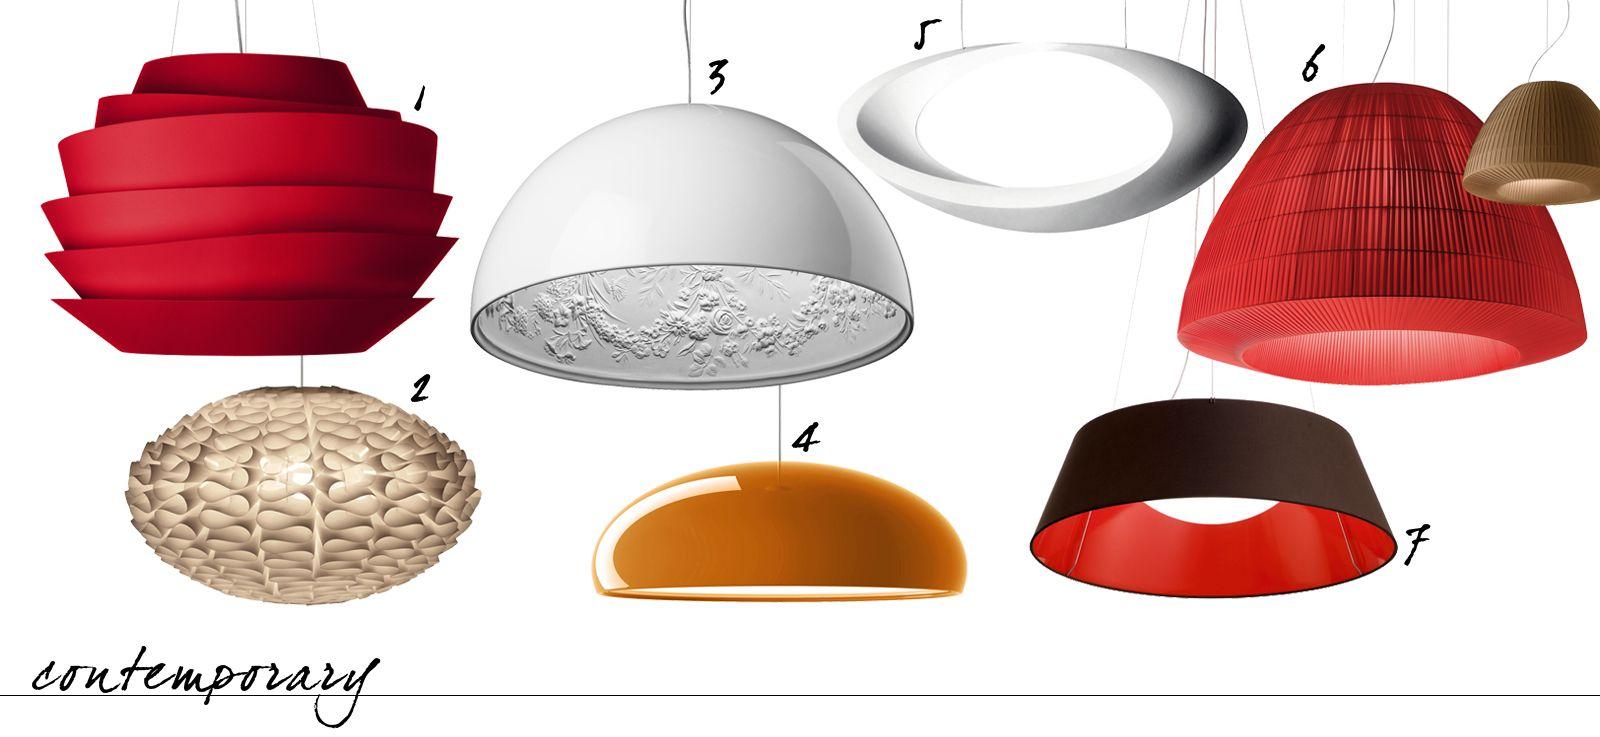 Lampade e lampadari a sospensione in tre stili diversi | Lampadari ...